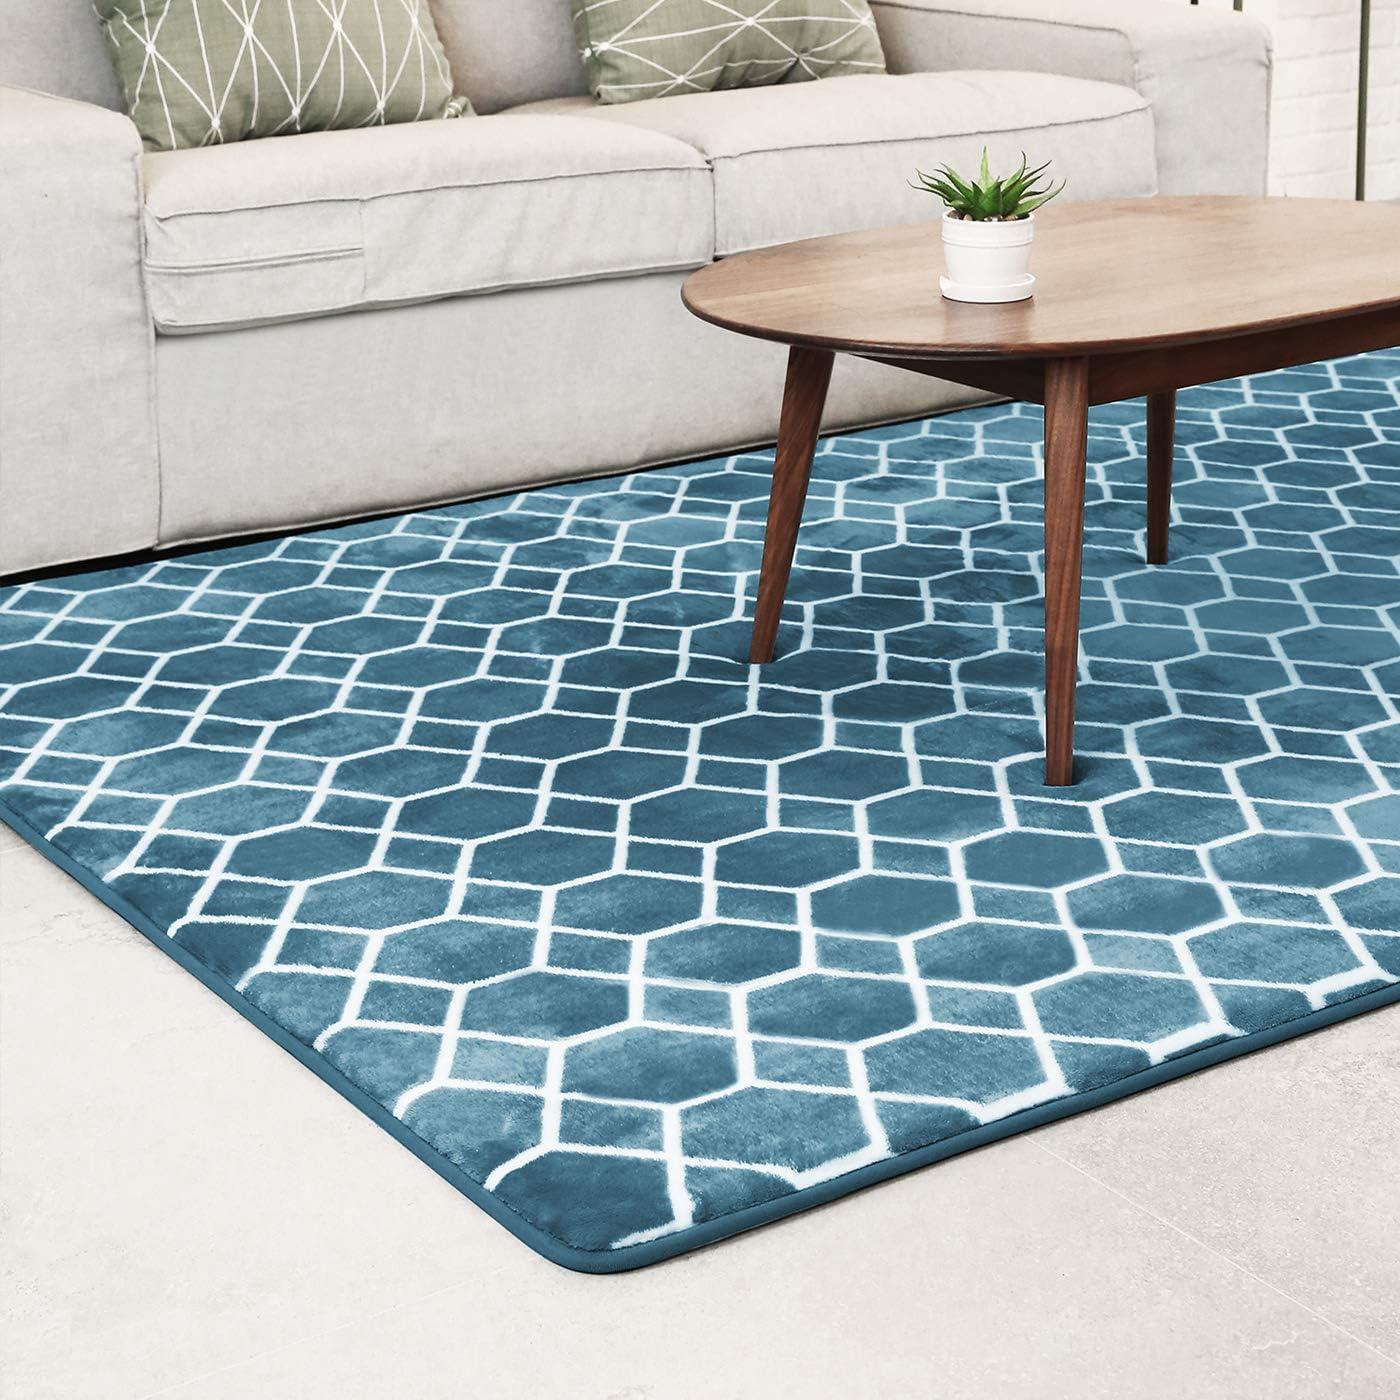 Shoesfree Barefoot Area Rugs 5'x 8' Large Area Rug Shag Rectangle Rug Turquoise Teal Area Rug Carpet